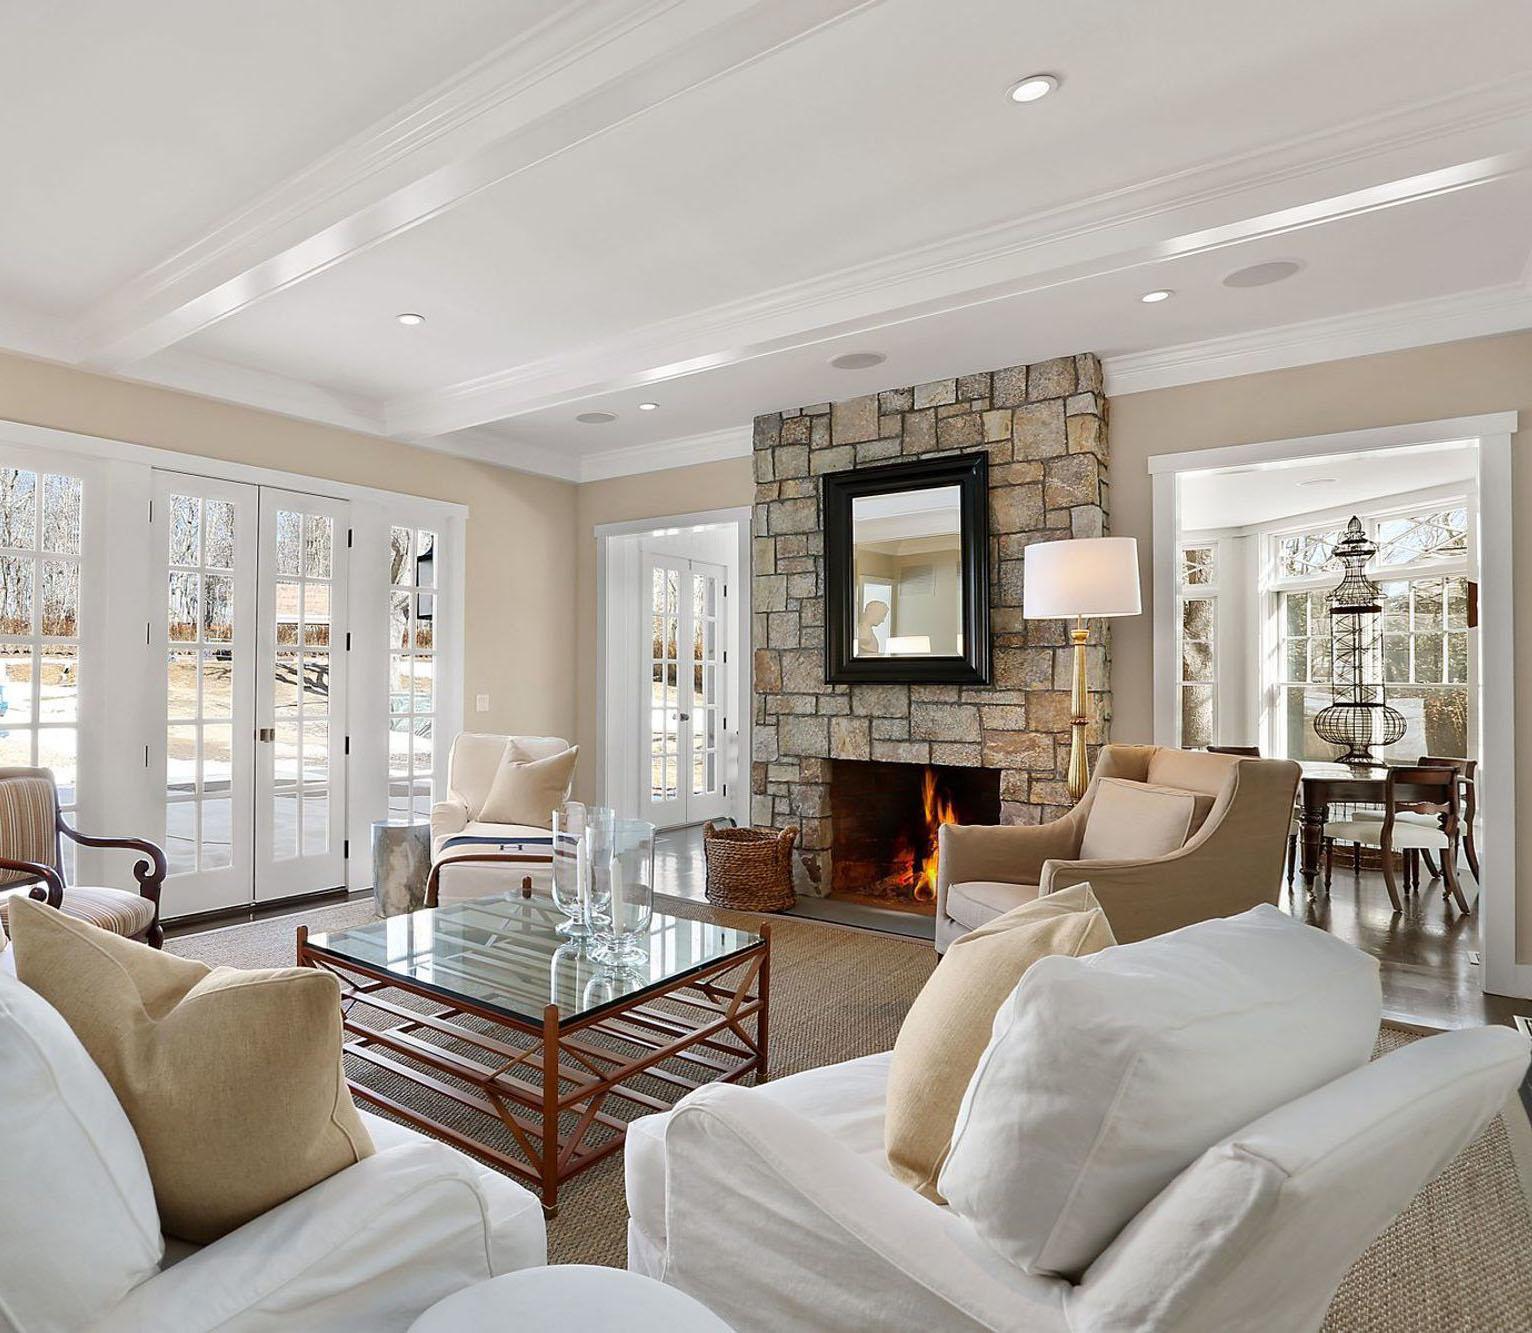 Real stone wood burning fireplace surround with polished concrete floors.